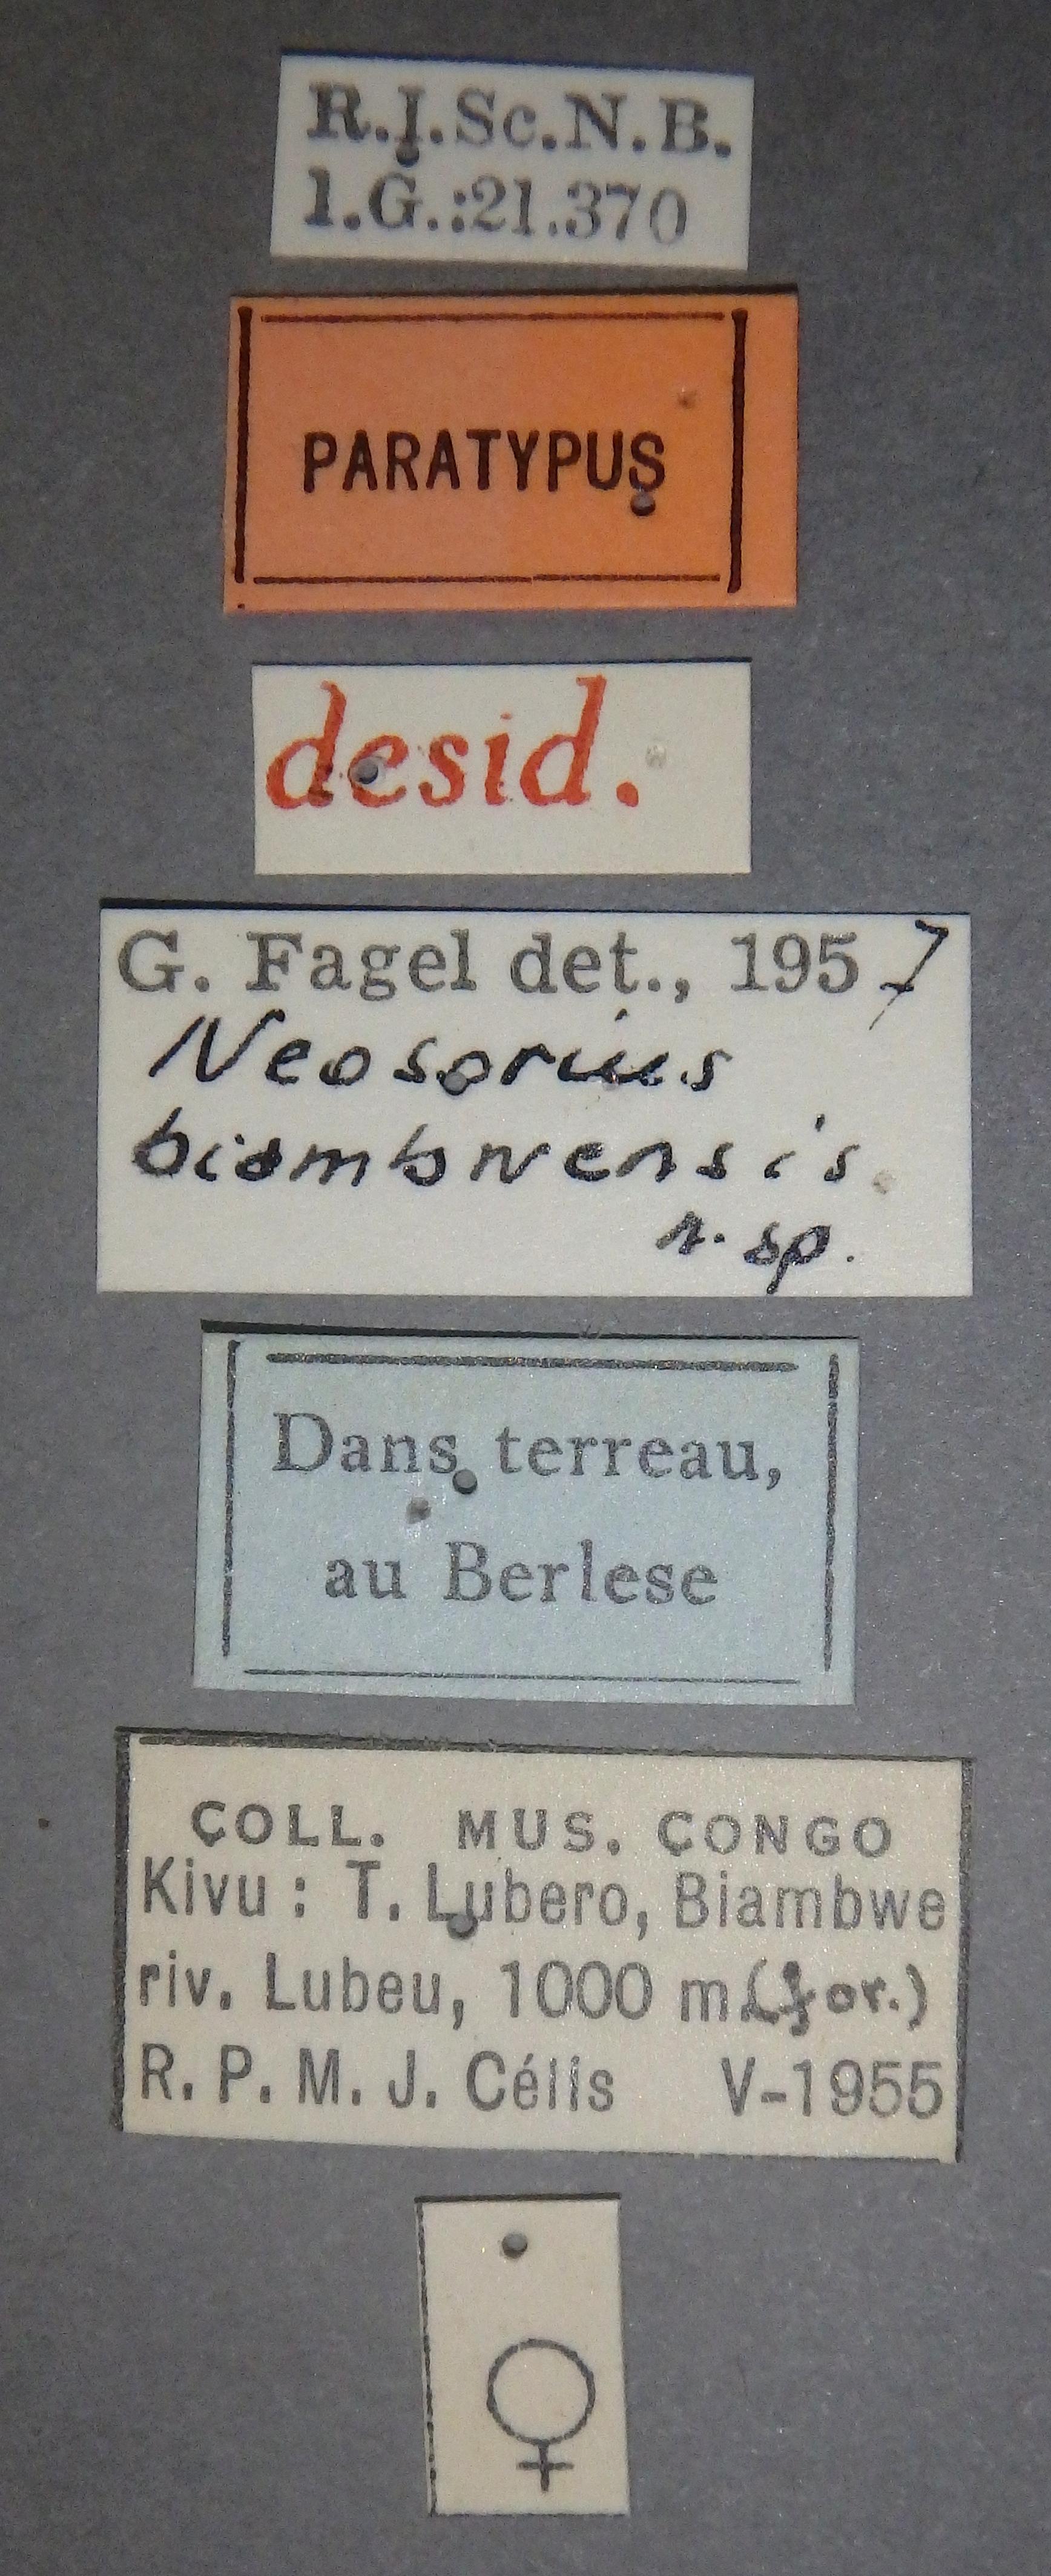 Neosorius biambwensis pt Lb.JPG